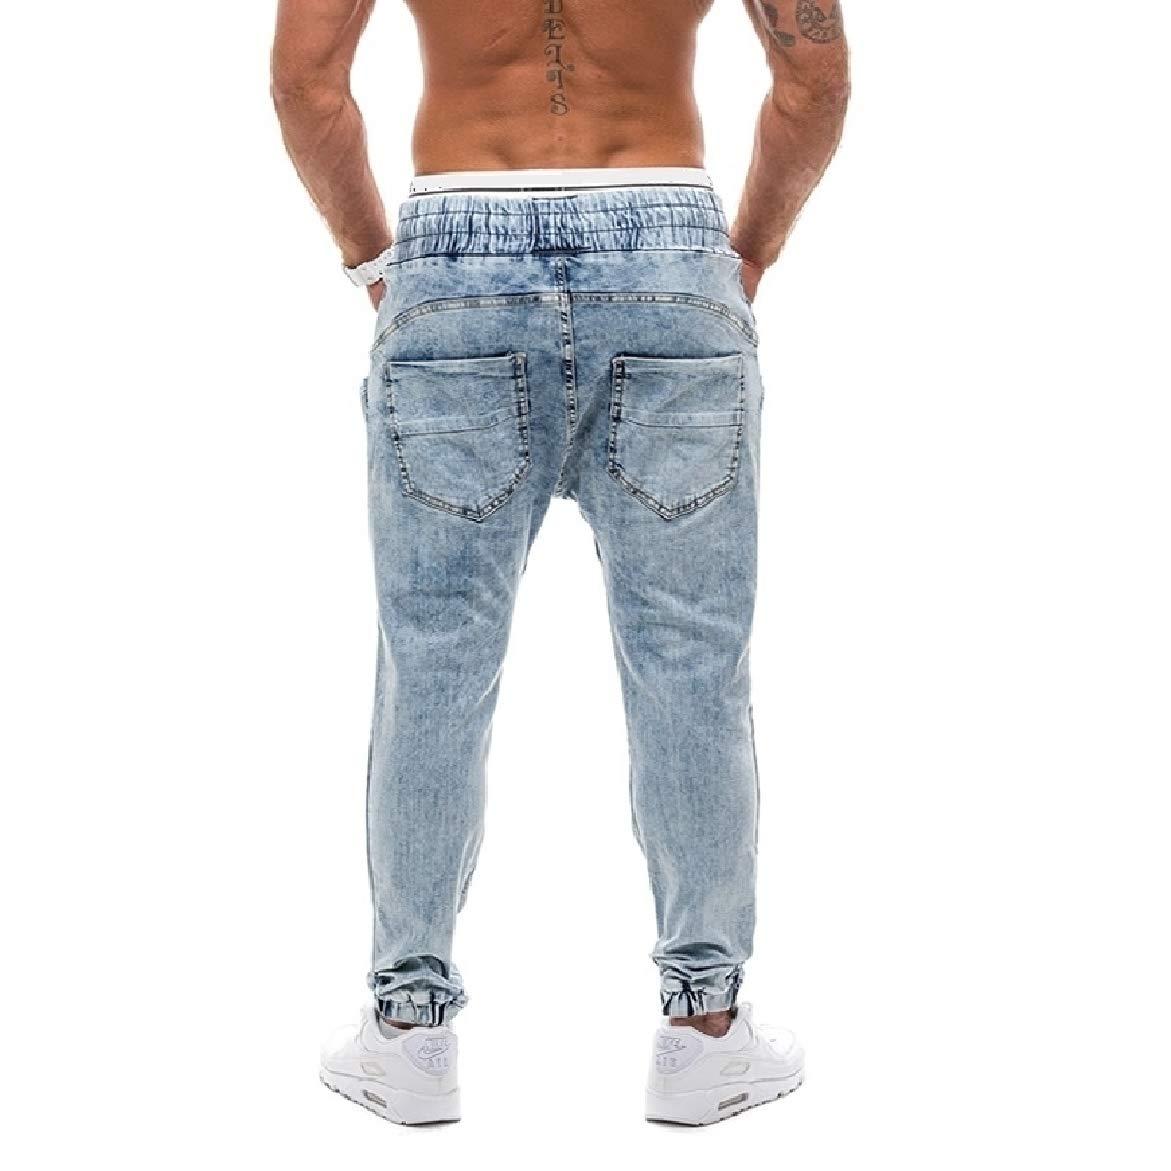 willwinMen WillingStart Mens Oversize Washed Cozy Retro Drawstring Regular Fit Jean